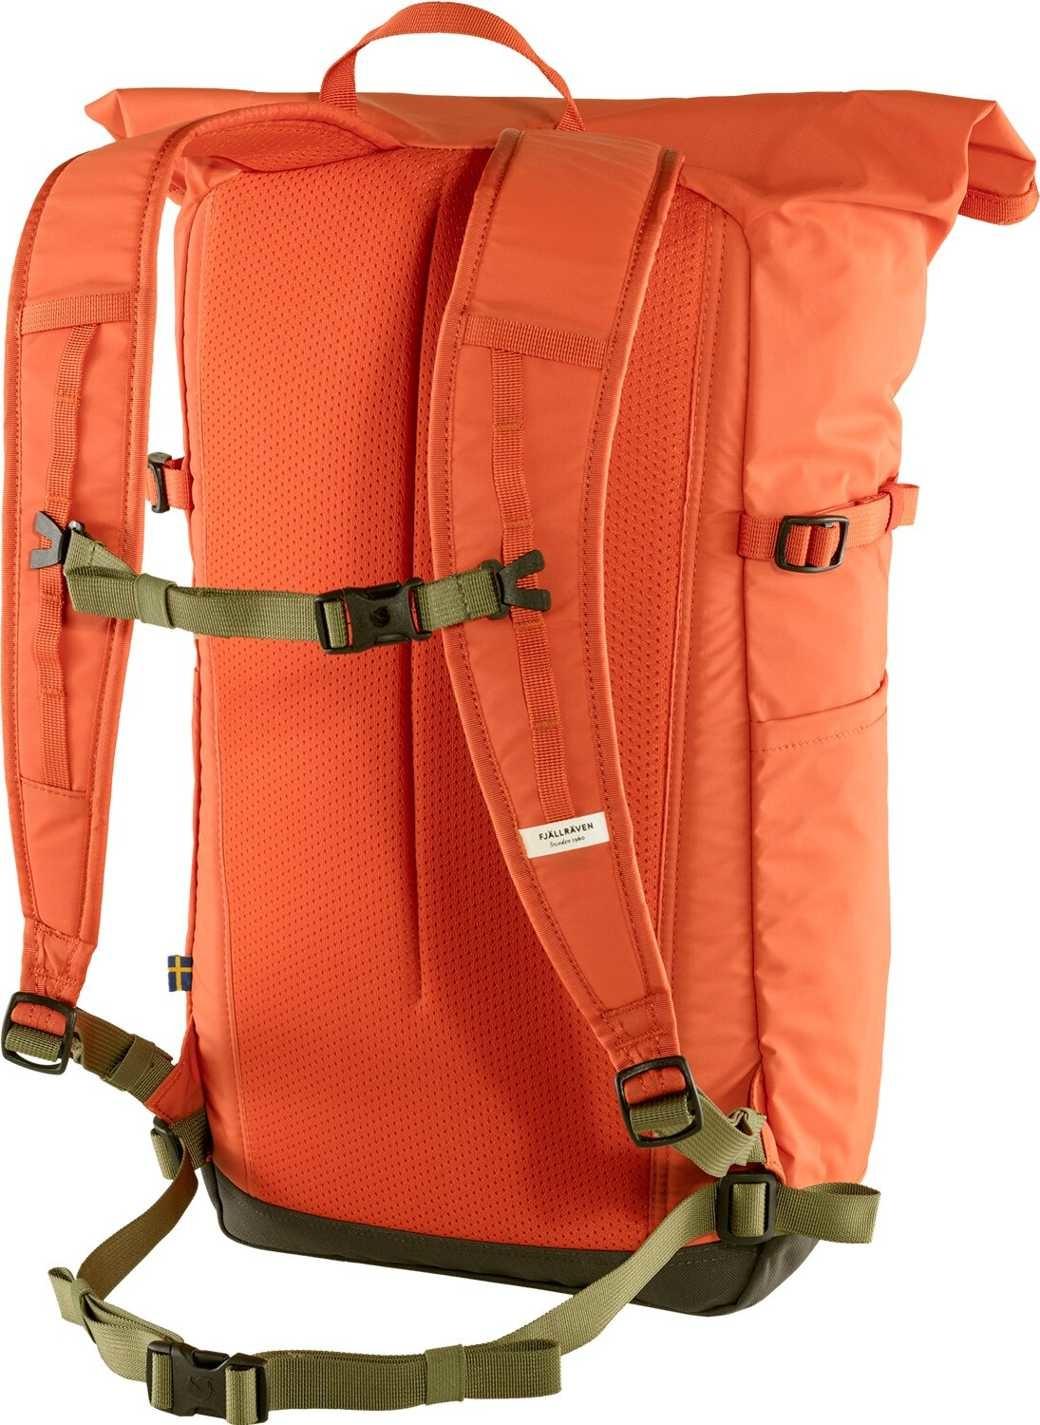 Fjällräven High Coast Foldsack 24  Rowan Red-2